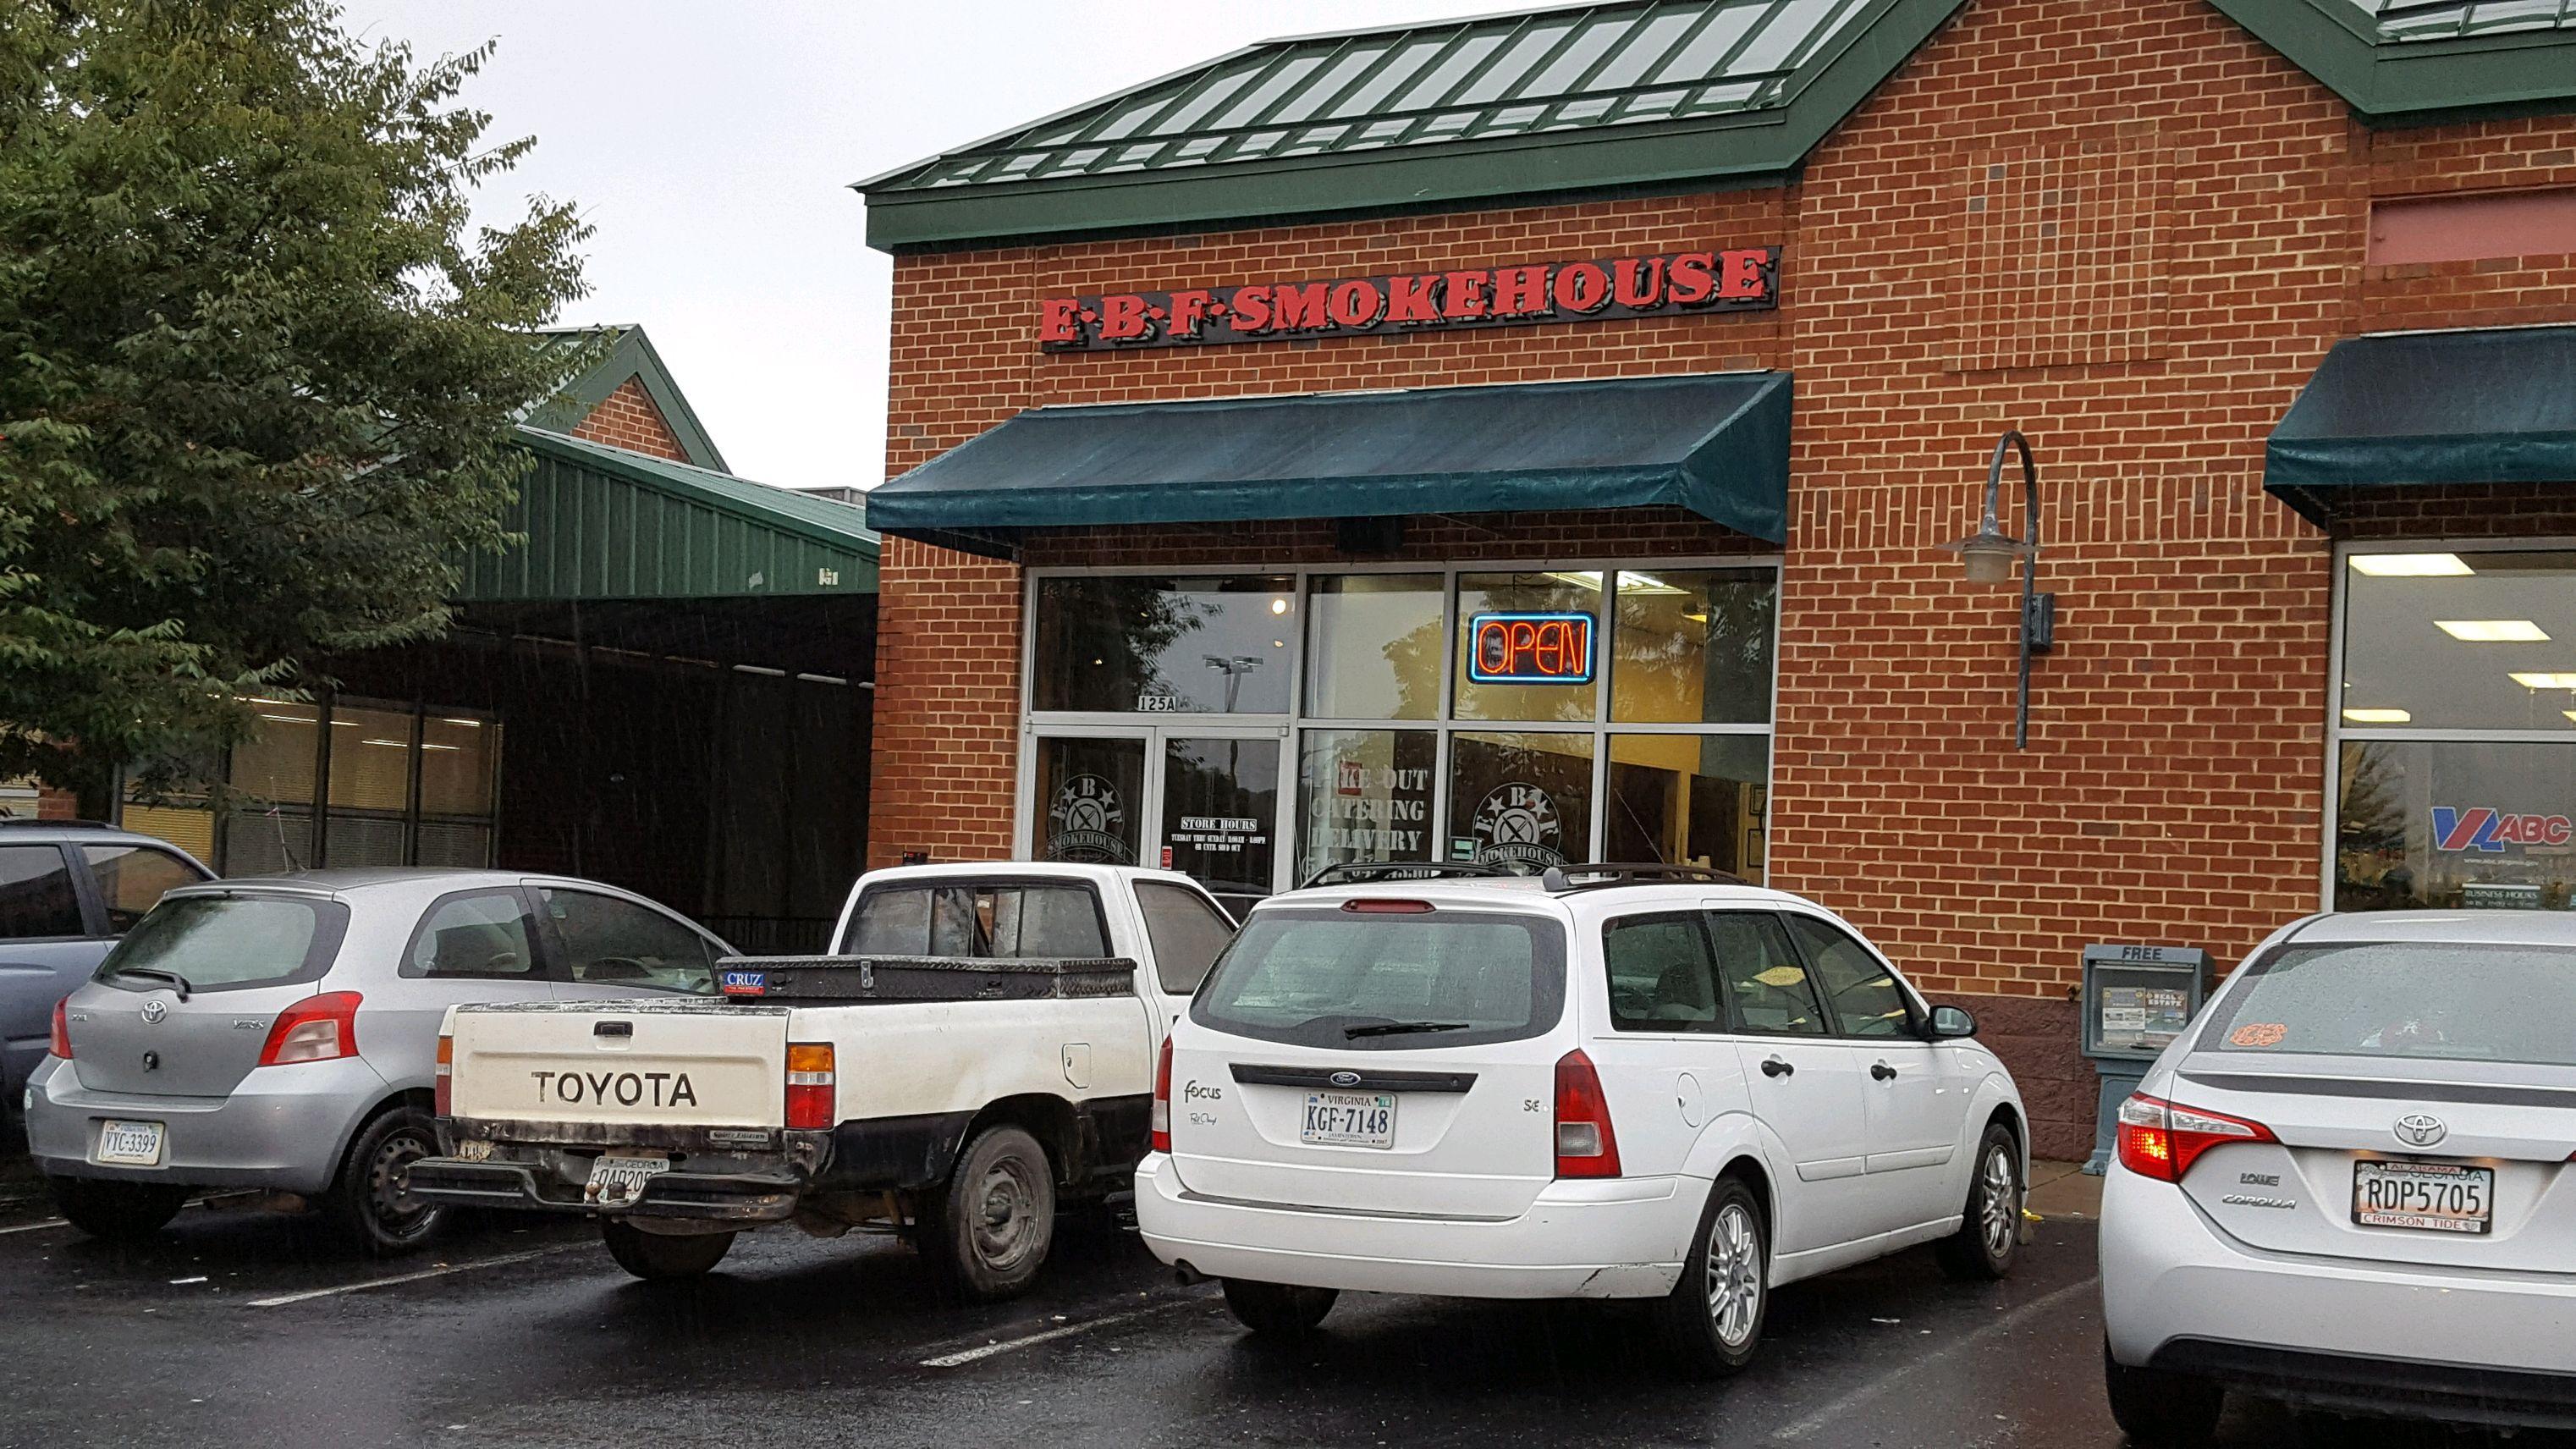 Ebf smokehouse waynesboro va waynesboro smokehouse